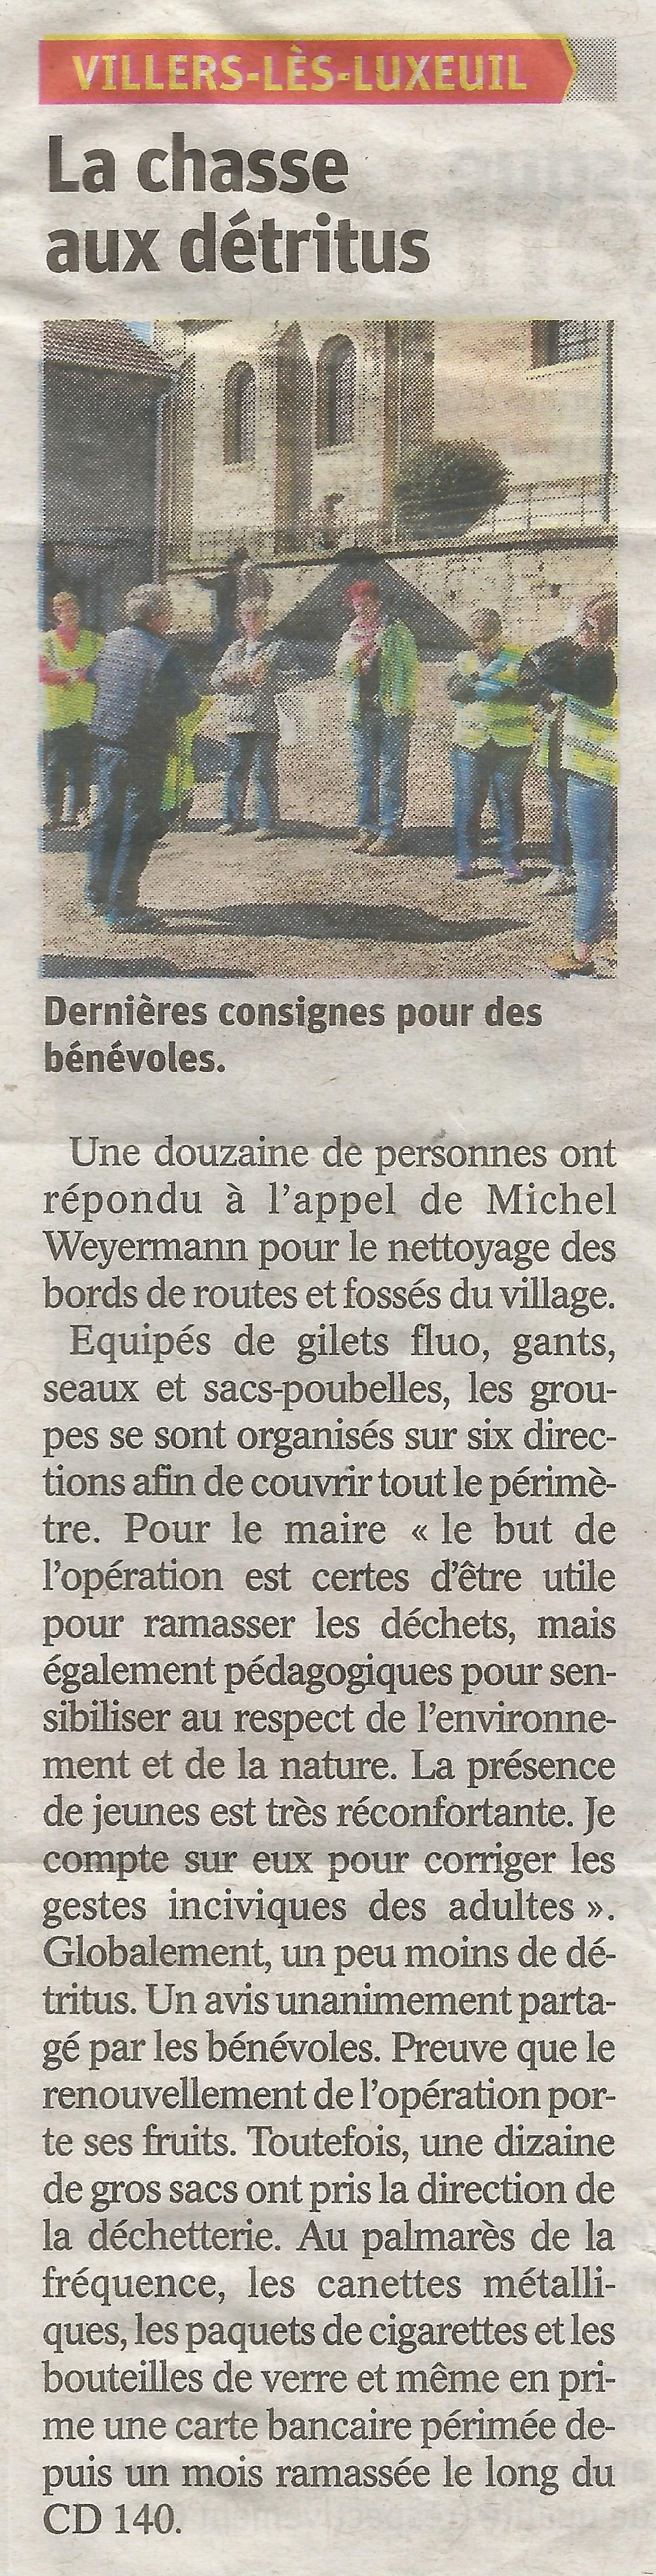 https://www.villers-les-luxeuil.com/projets/villers/files/images/2018_Mairie/Presse/2018_03_2999.jpg